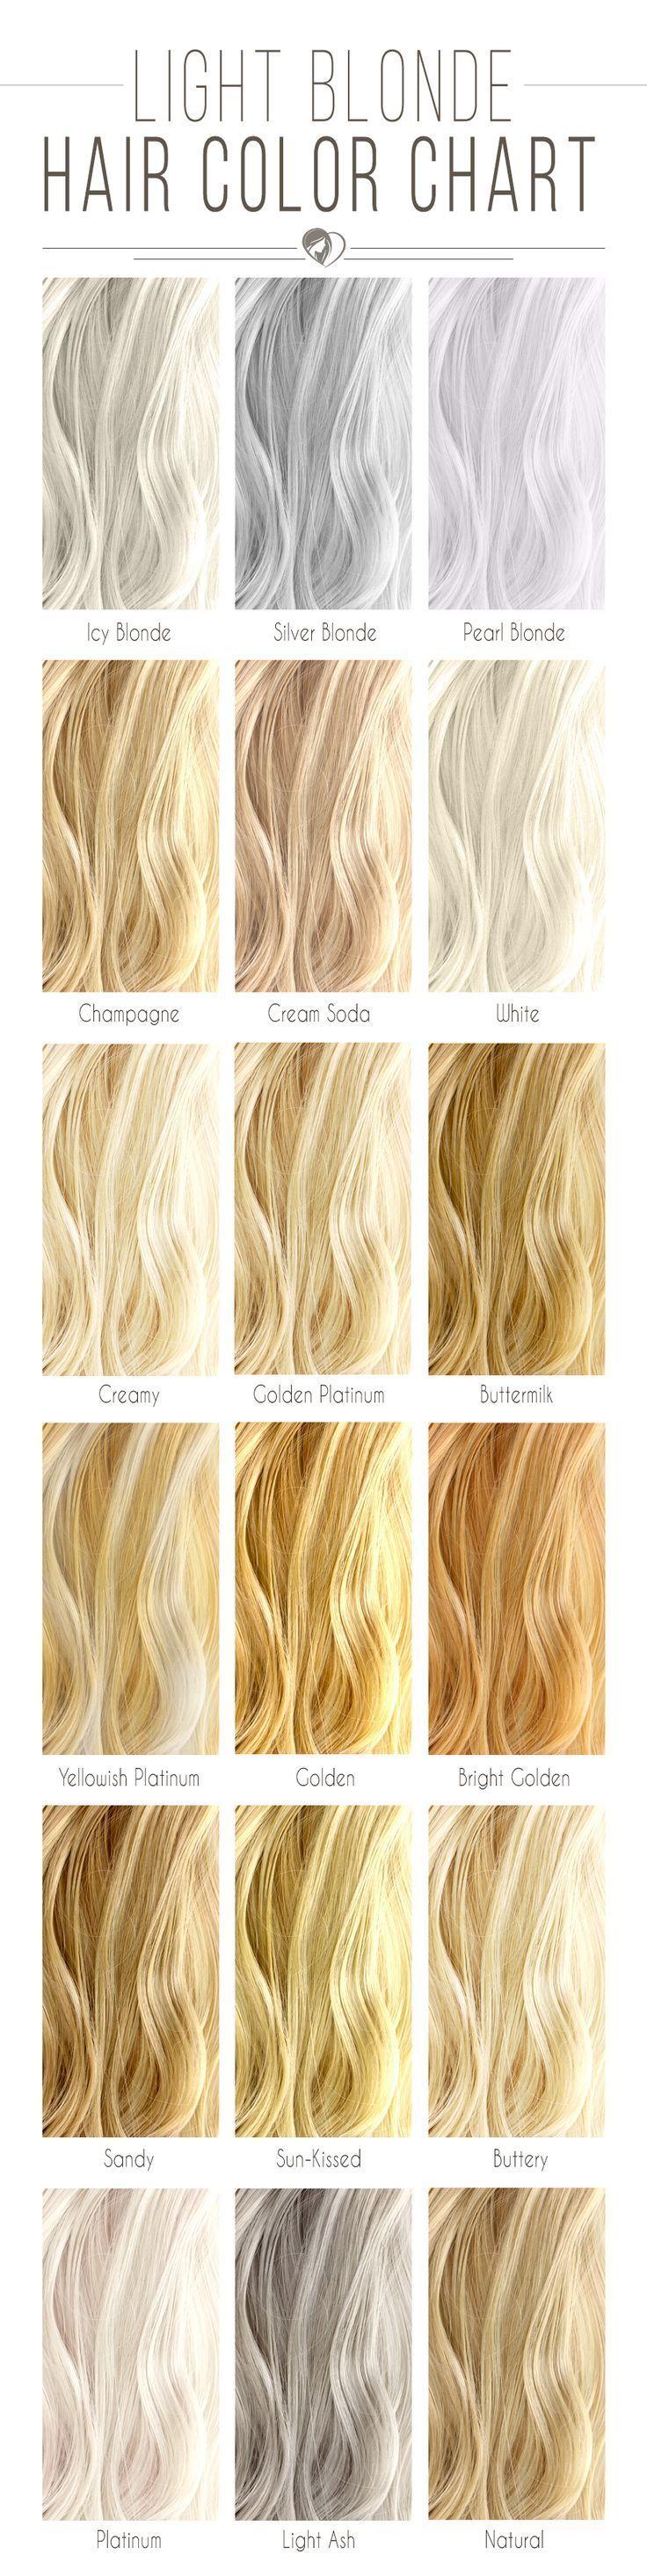 Farbtabelle von hellblondem Haar #blondhaardiagramm Farbtabelle von blondem Haar ist dein